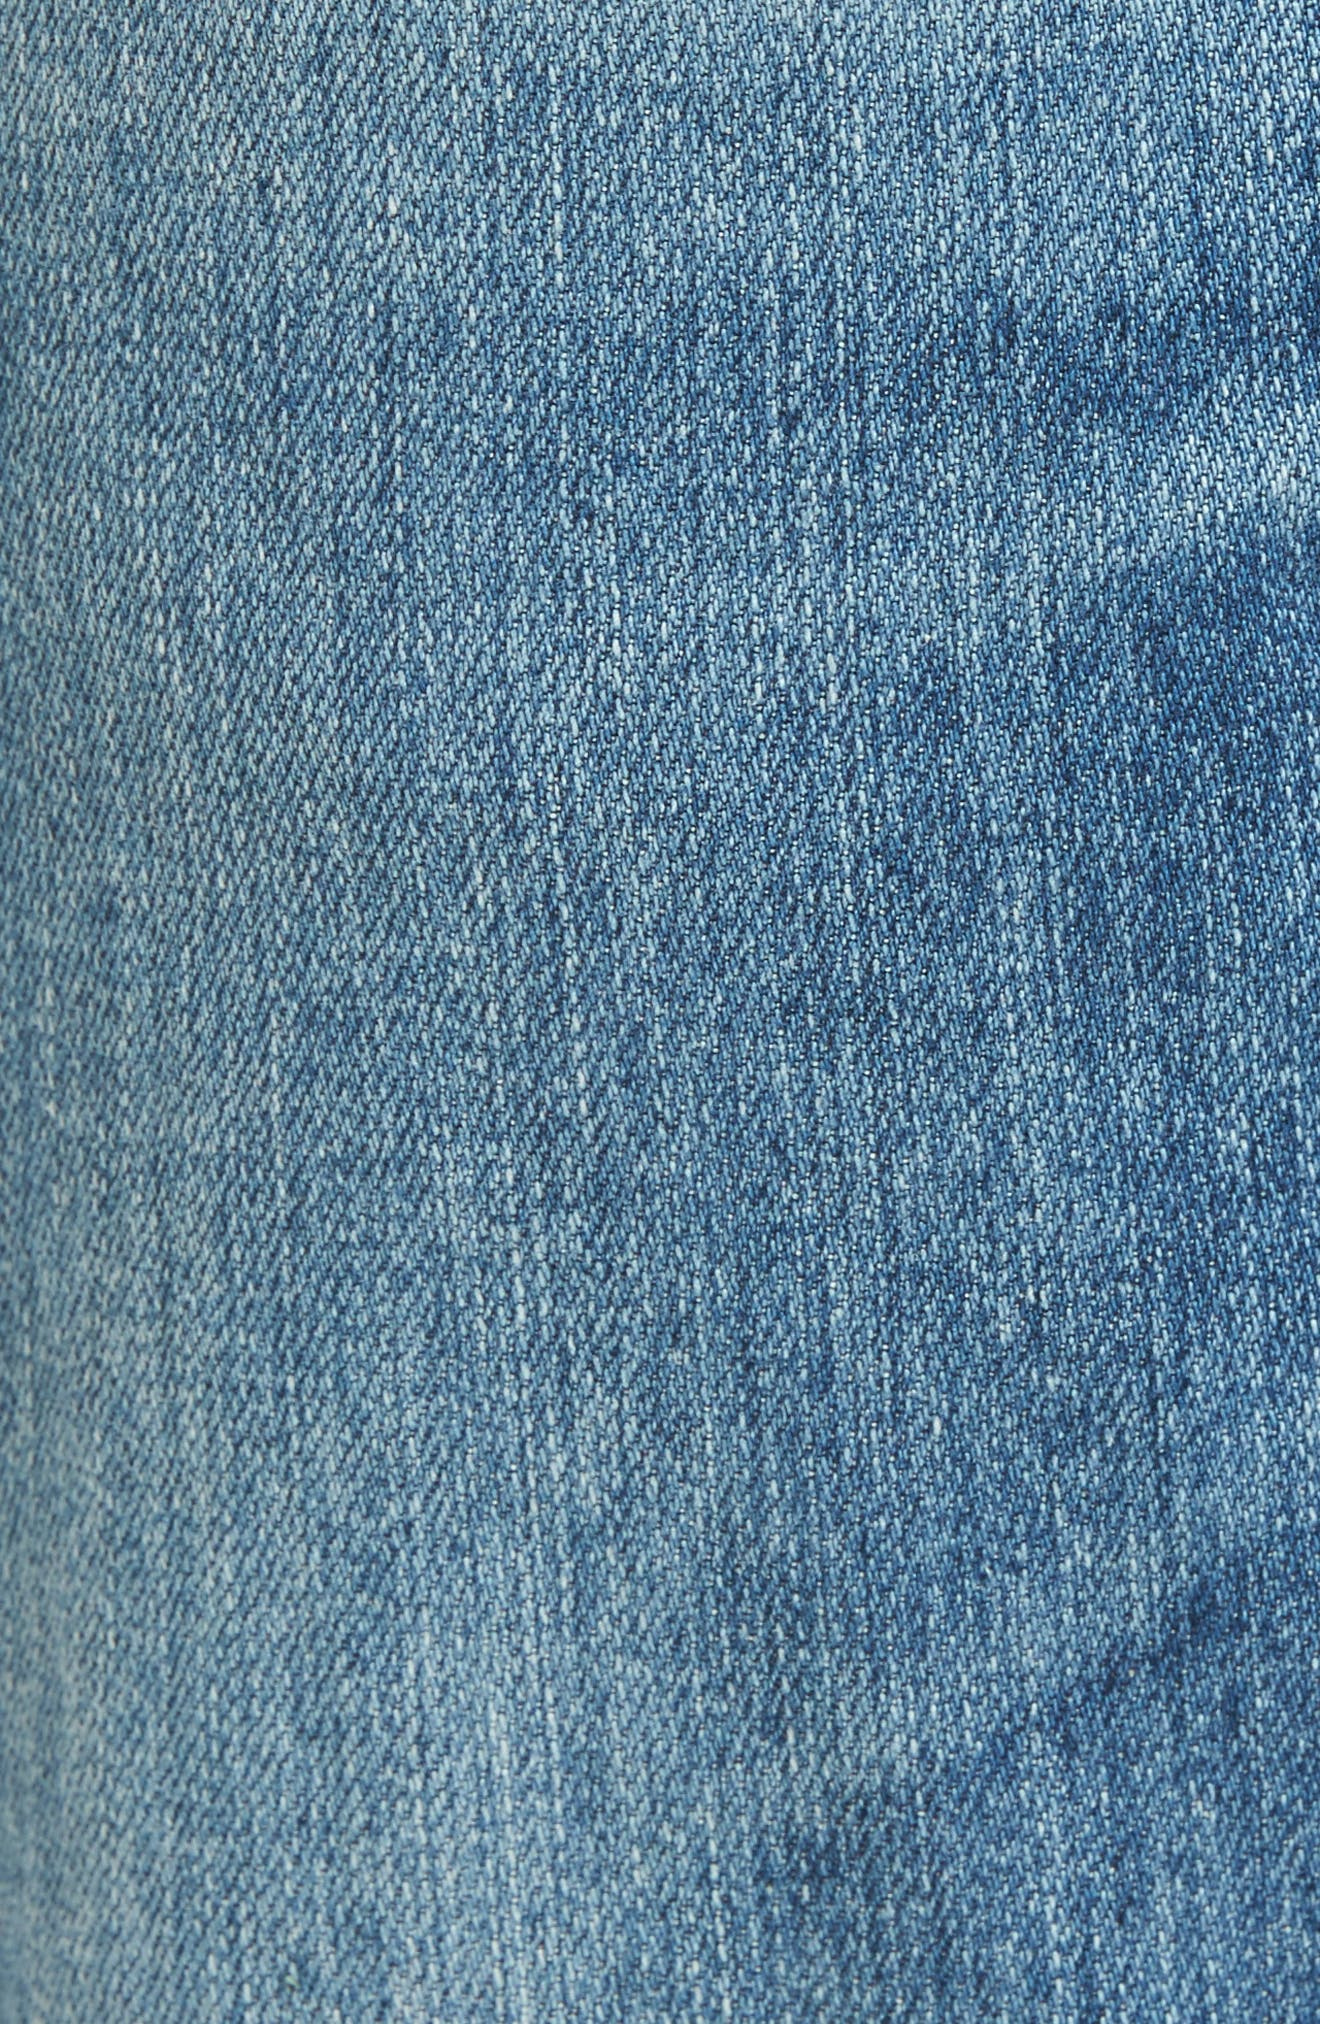 Ives Straight Leg Jeans,                             Alternate thumbnail 5, color,                             16 Years Broken Ground